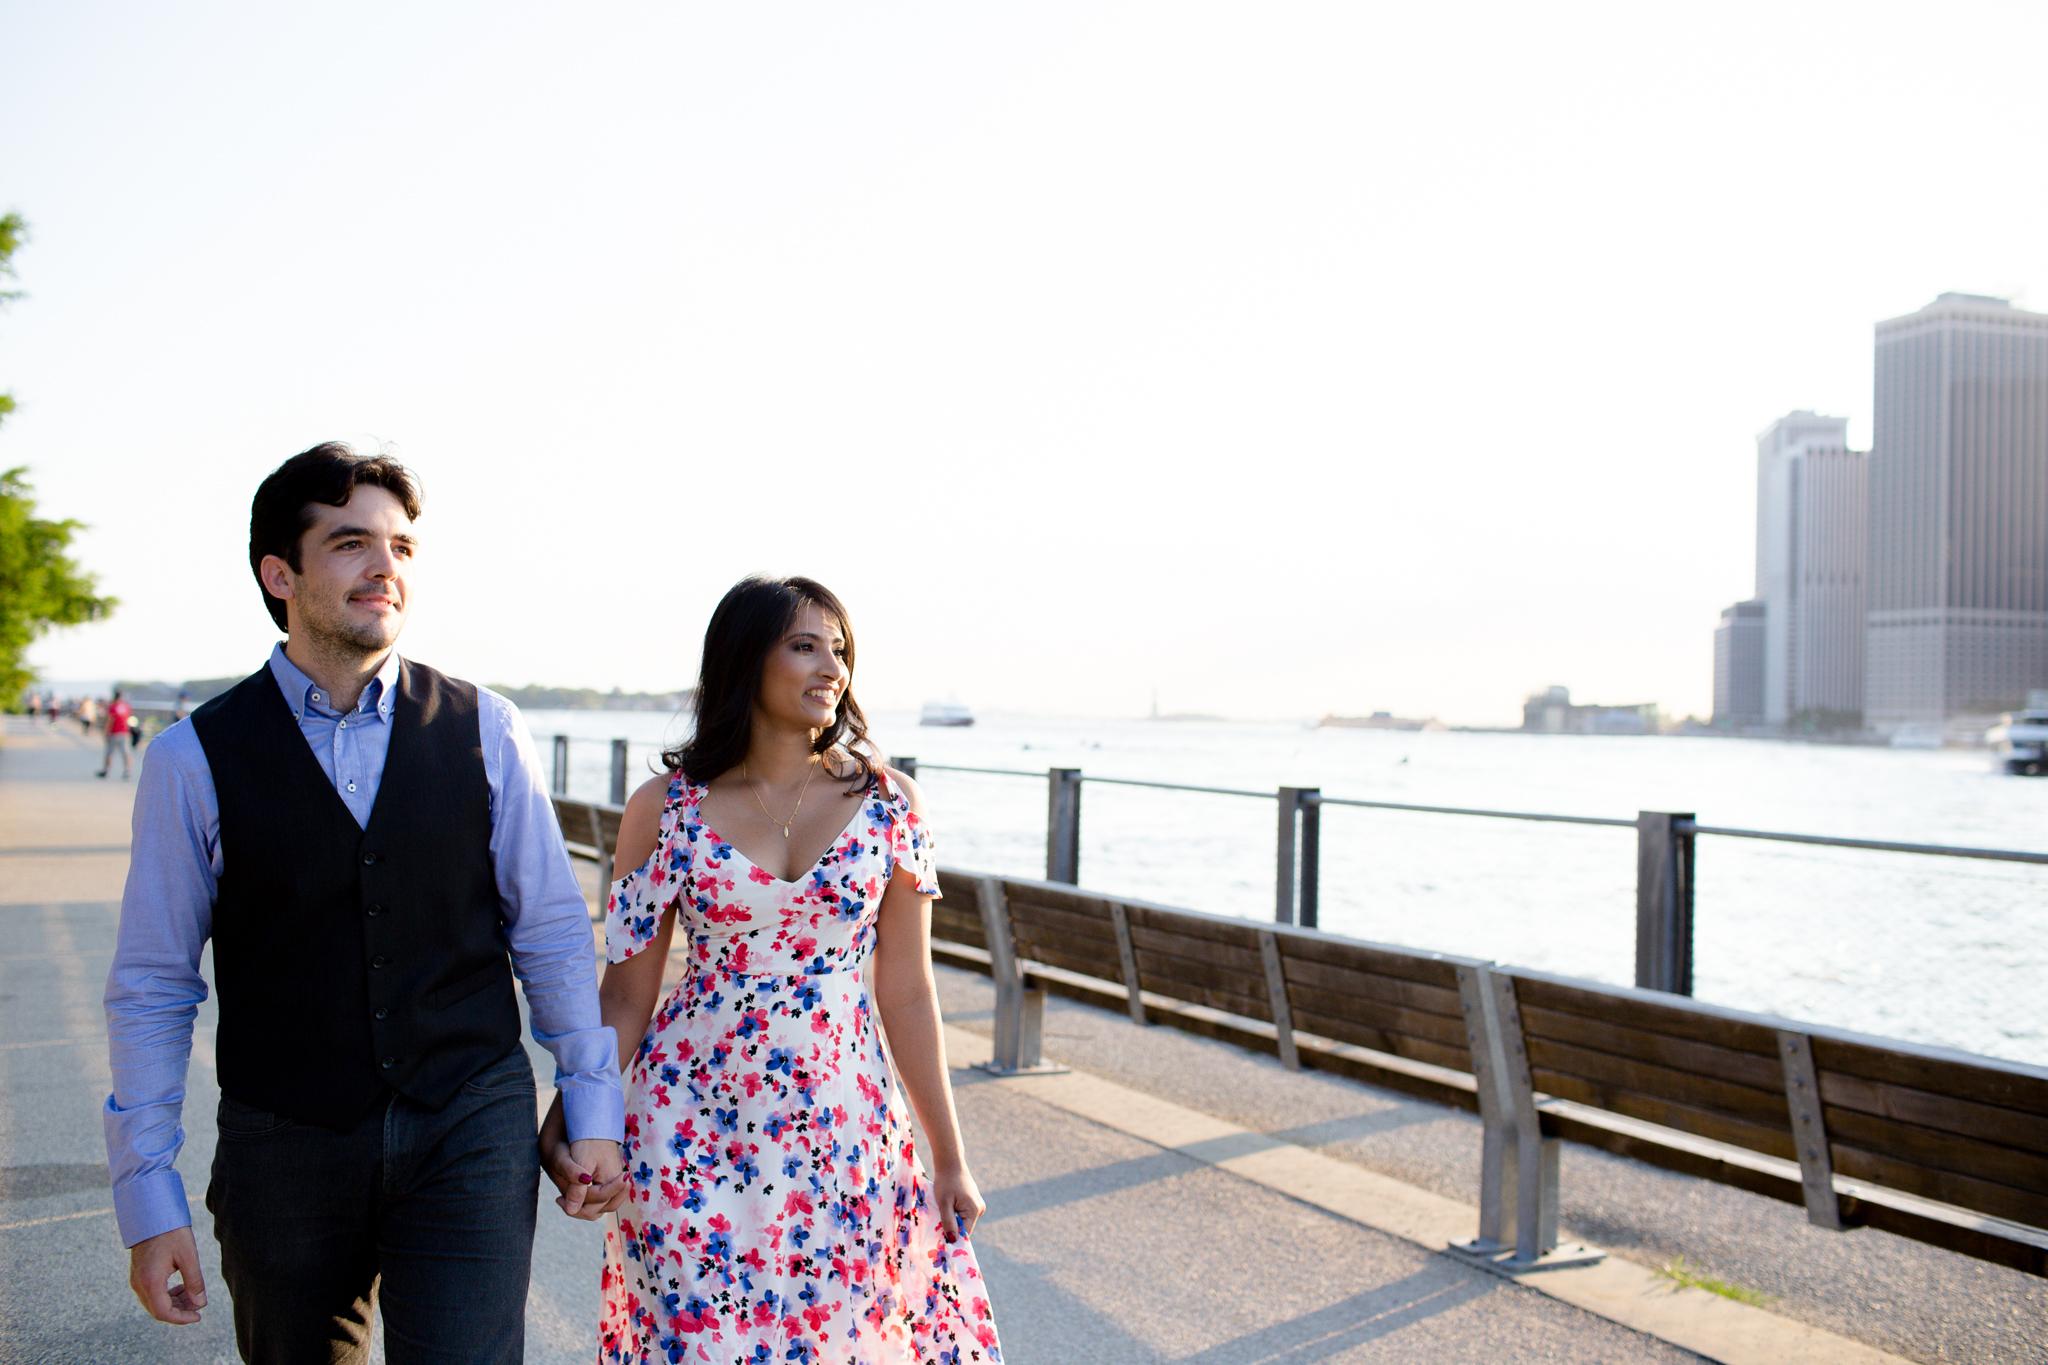 engagement-photography-brooklyn-bridge-park-4411.jpg